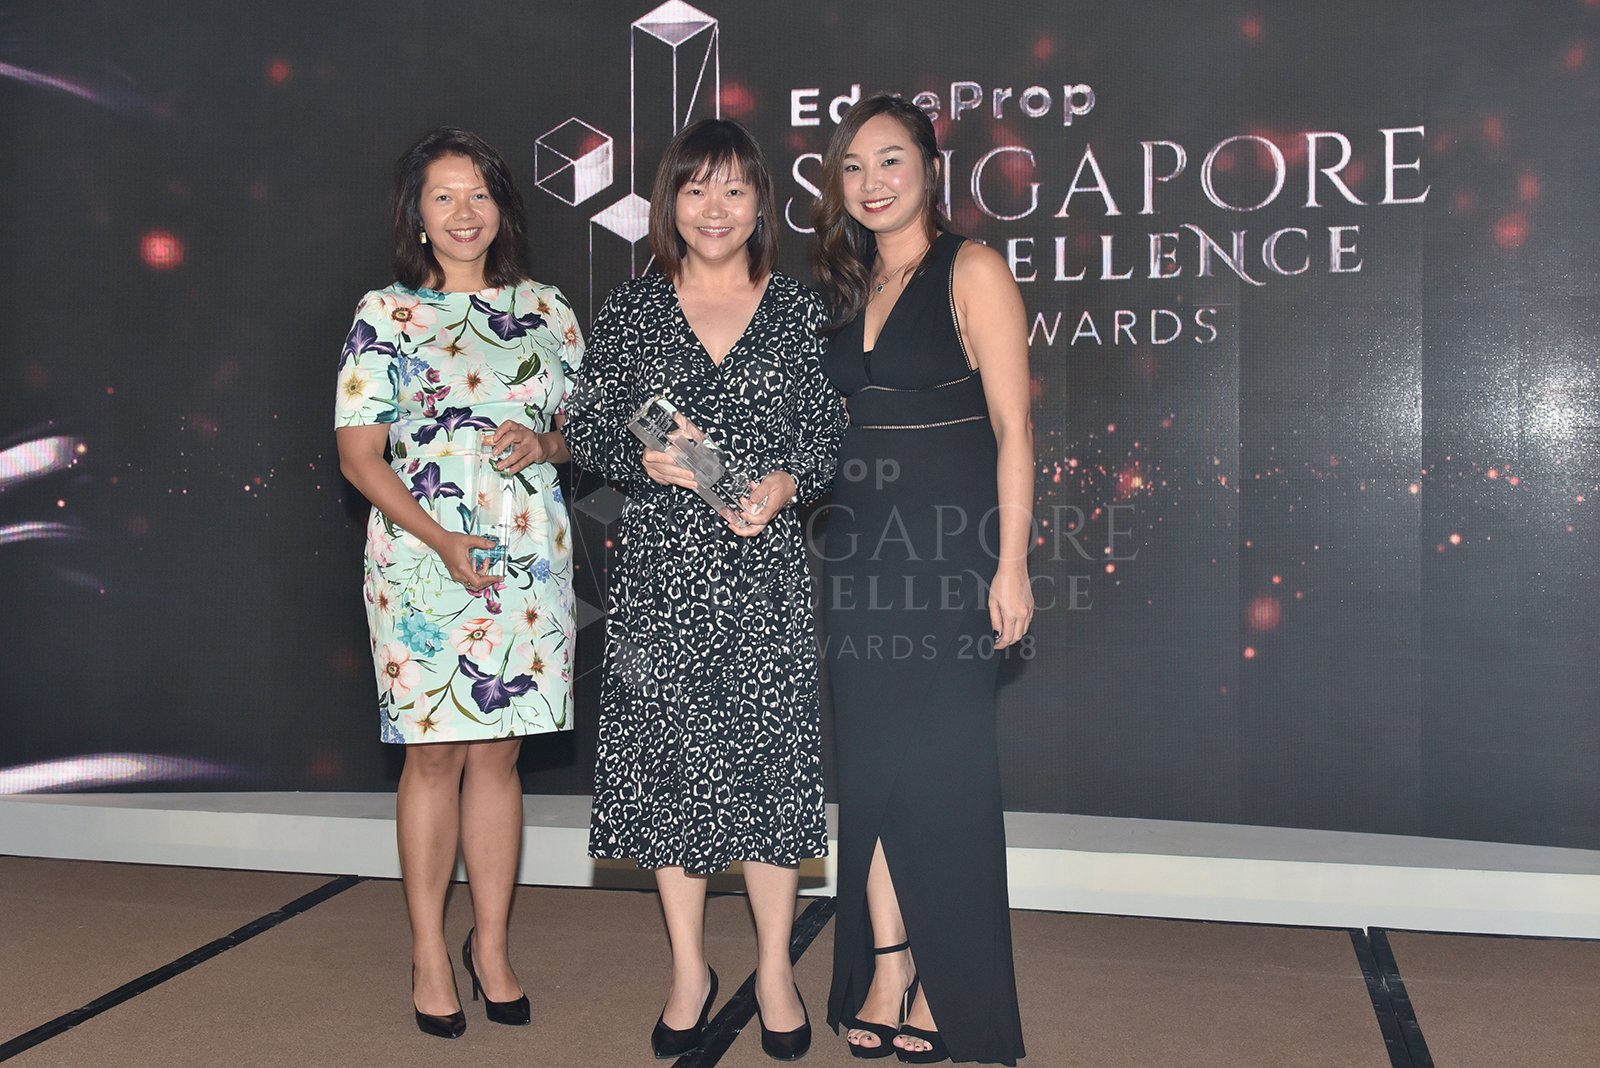 LEI_EDGEPROP_EXCELLENCE_AWARDS_2018_WINNERS_29_AC.jpg